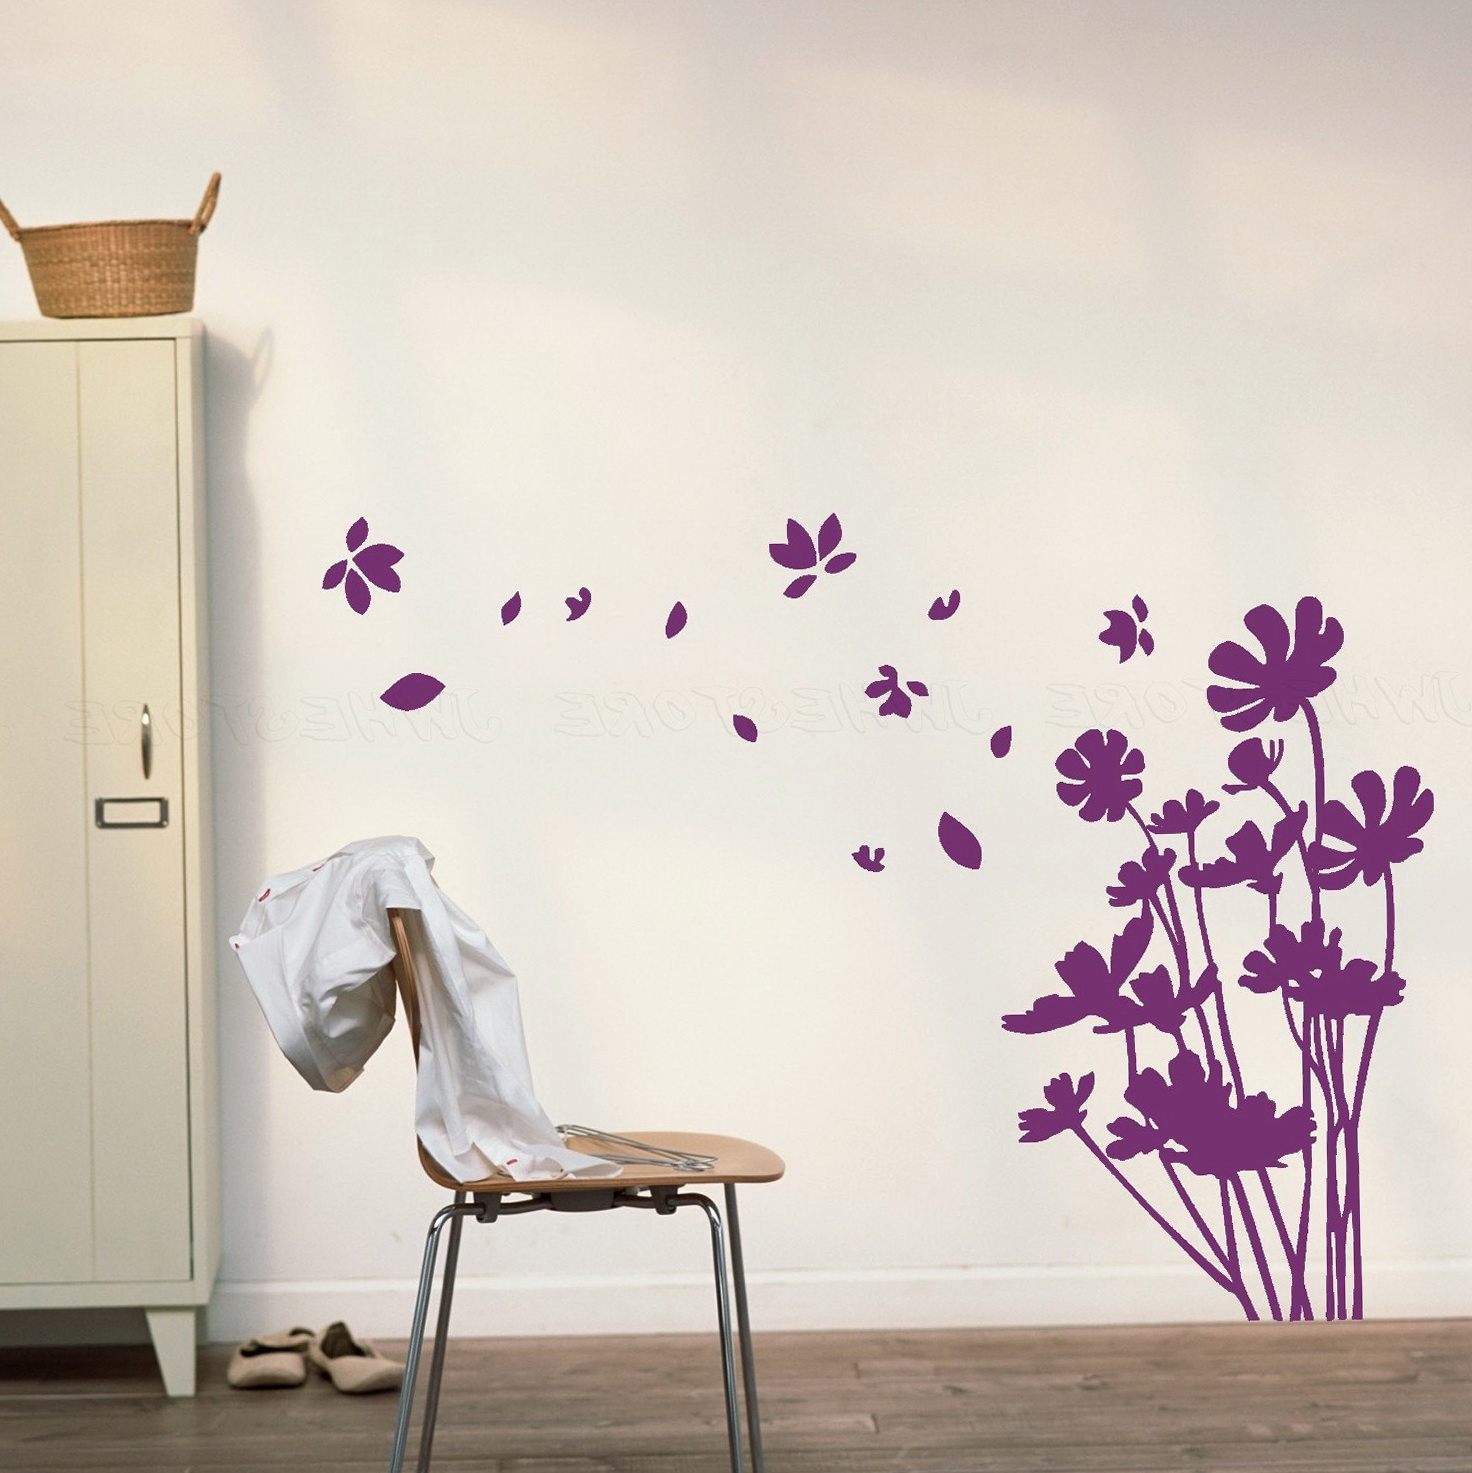 Floral Wall Art Designs